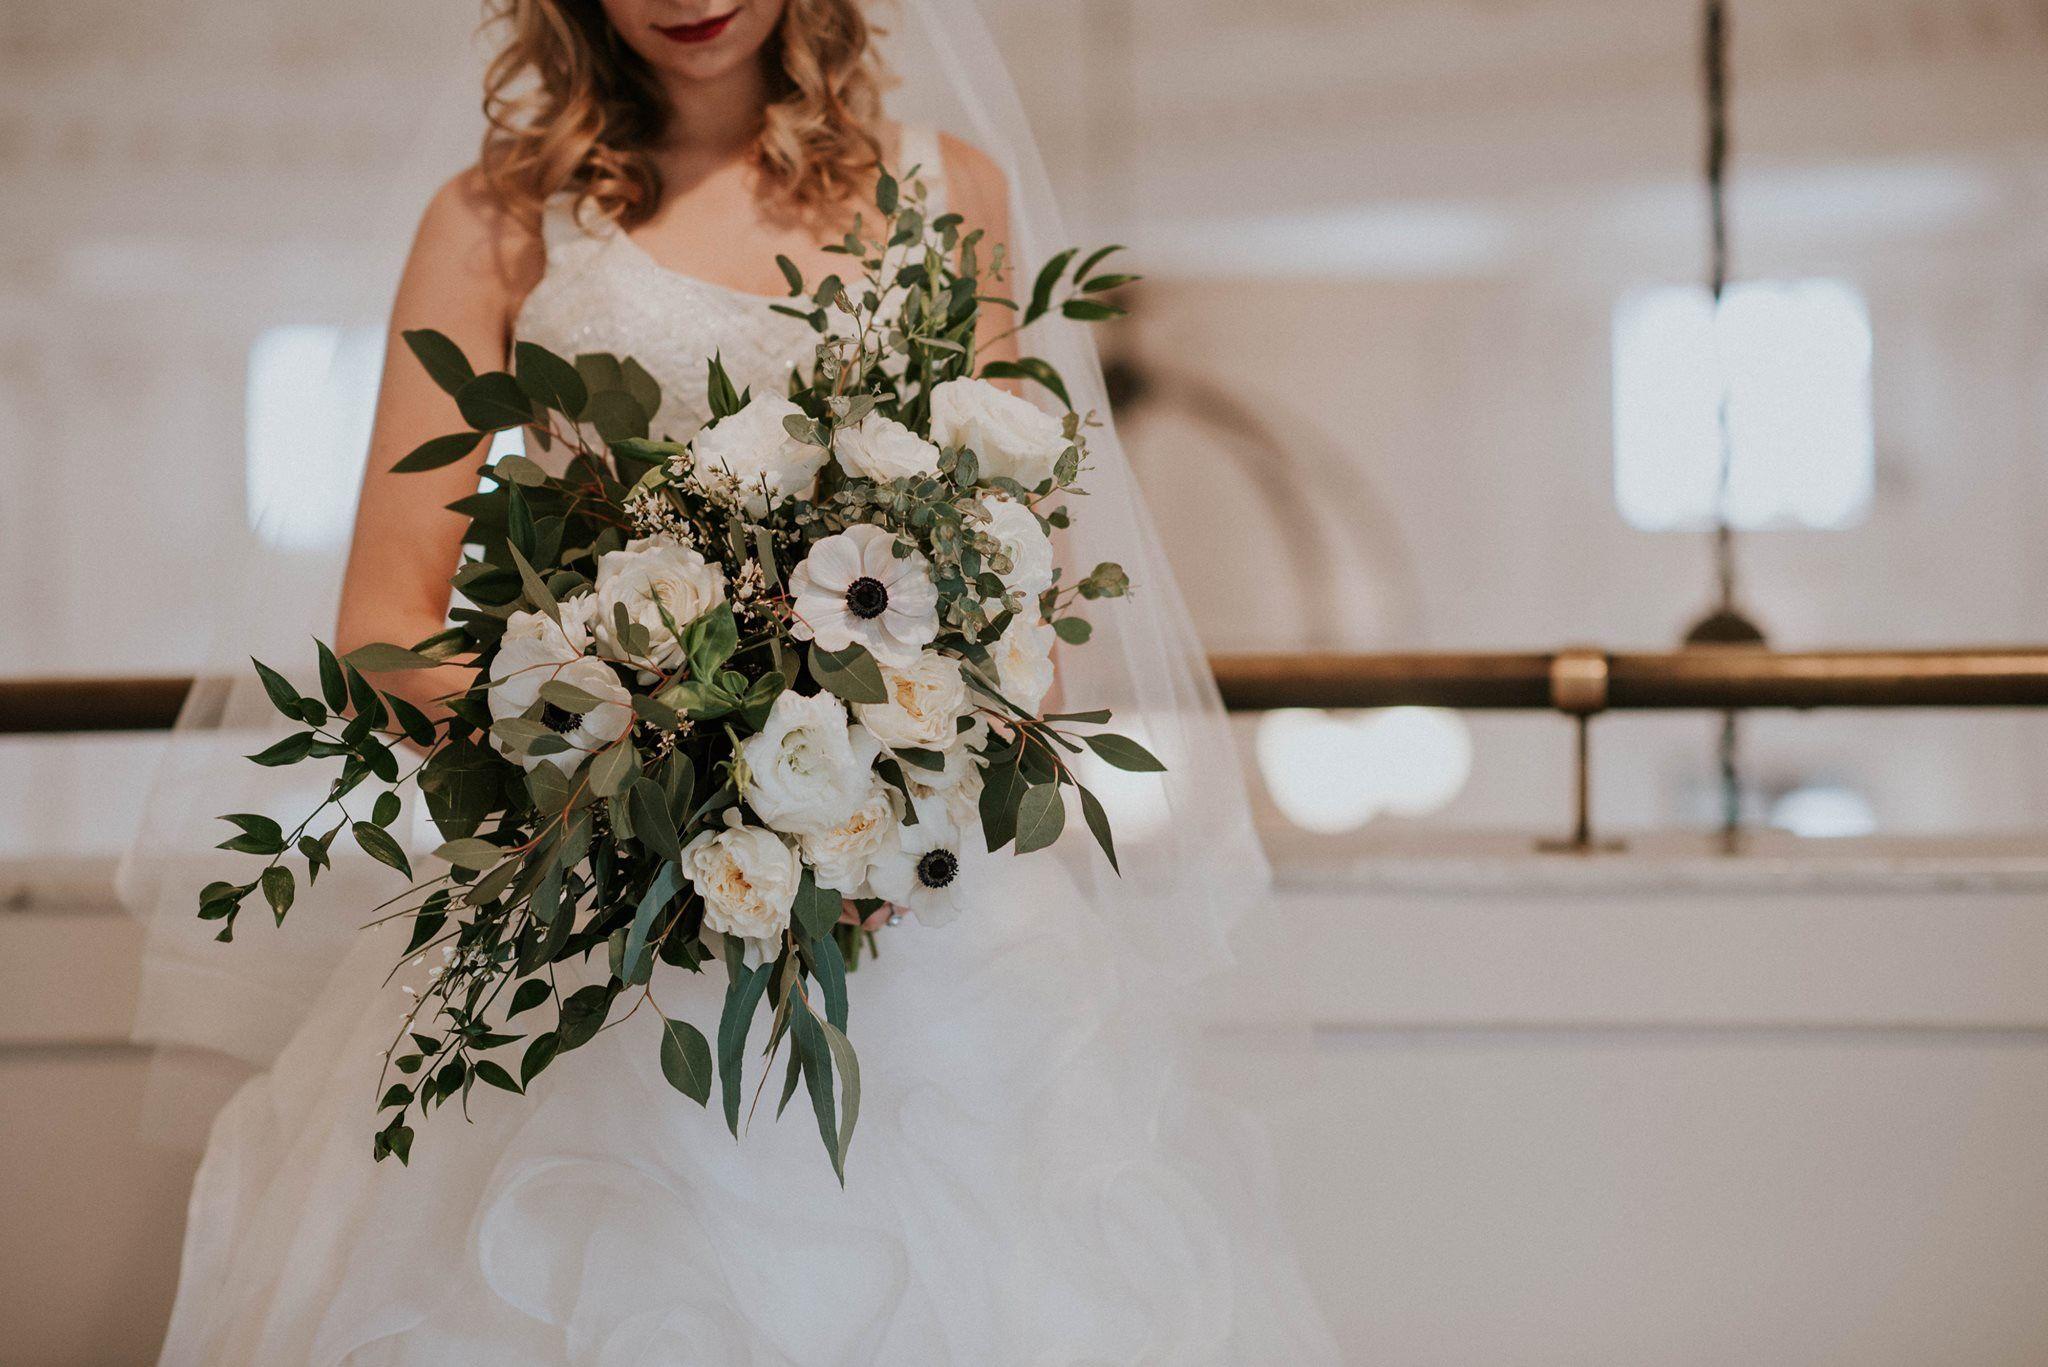 Bridal Bouquet With Silver Dollar Gunni Willow Eucalyptus